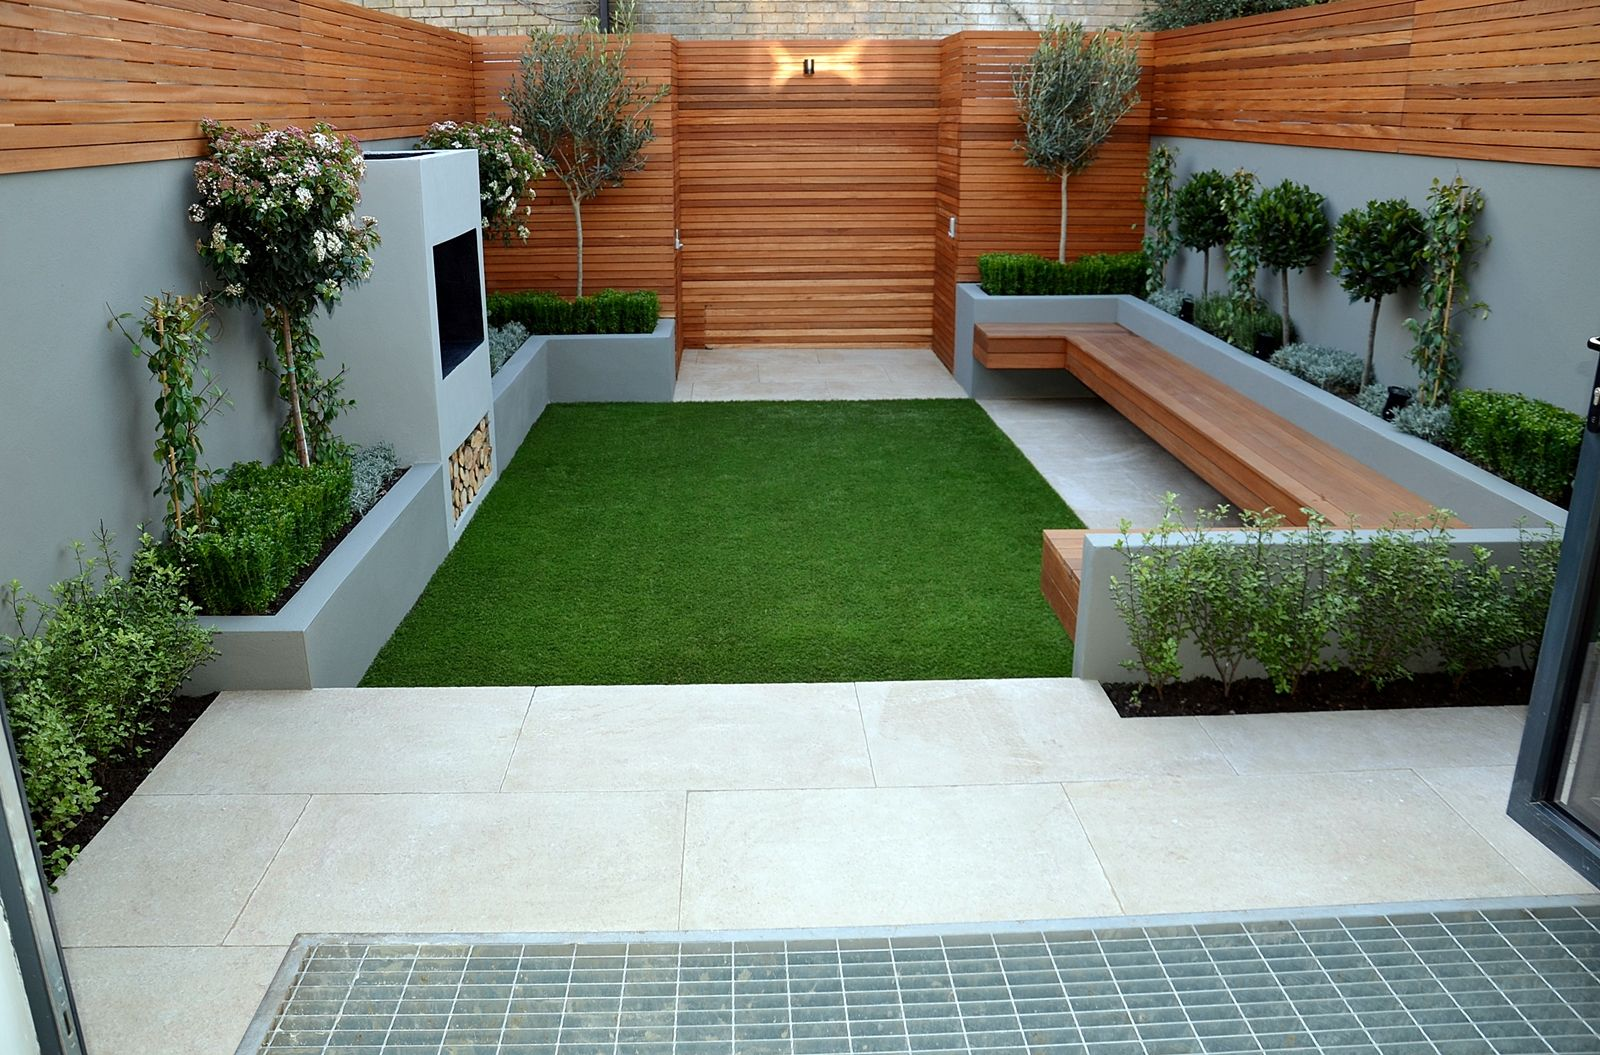 Contemporary Modern Small Garden Designer Anewgarden Battersea Clapham Balham Dulwich London Urban Garden Design Modern Backyard Landscaping